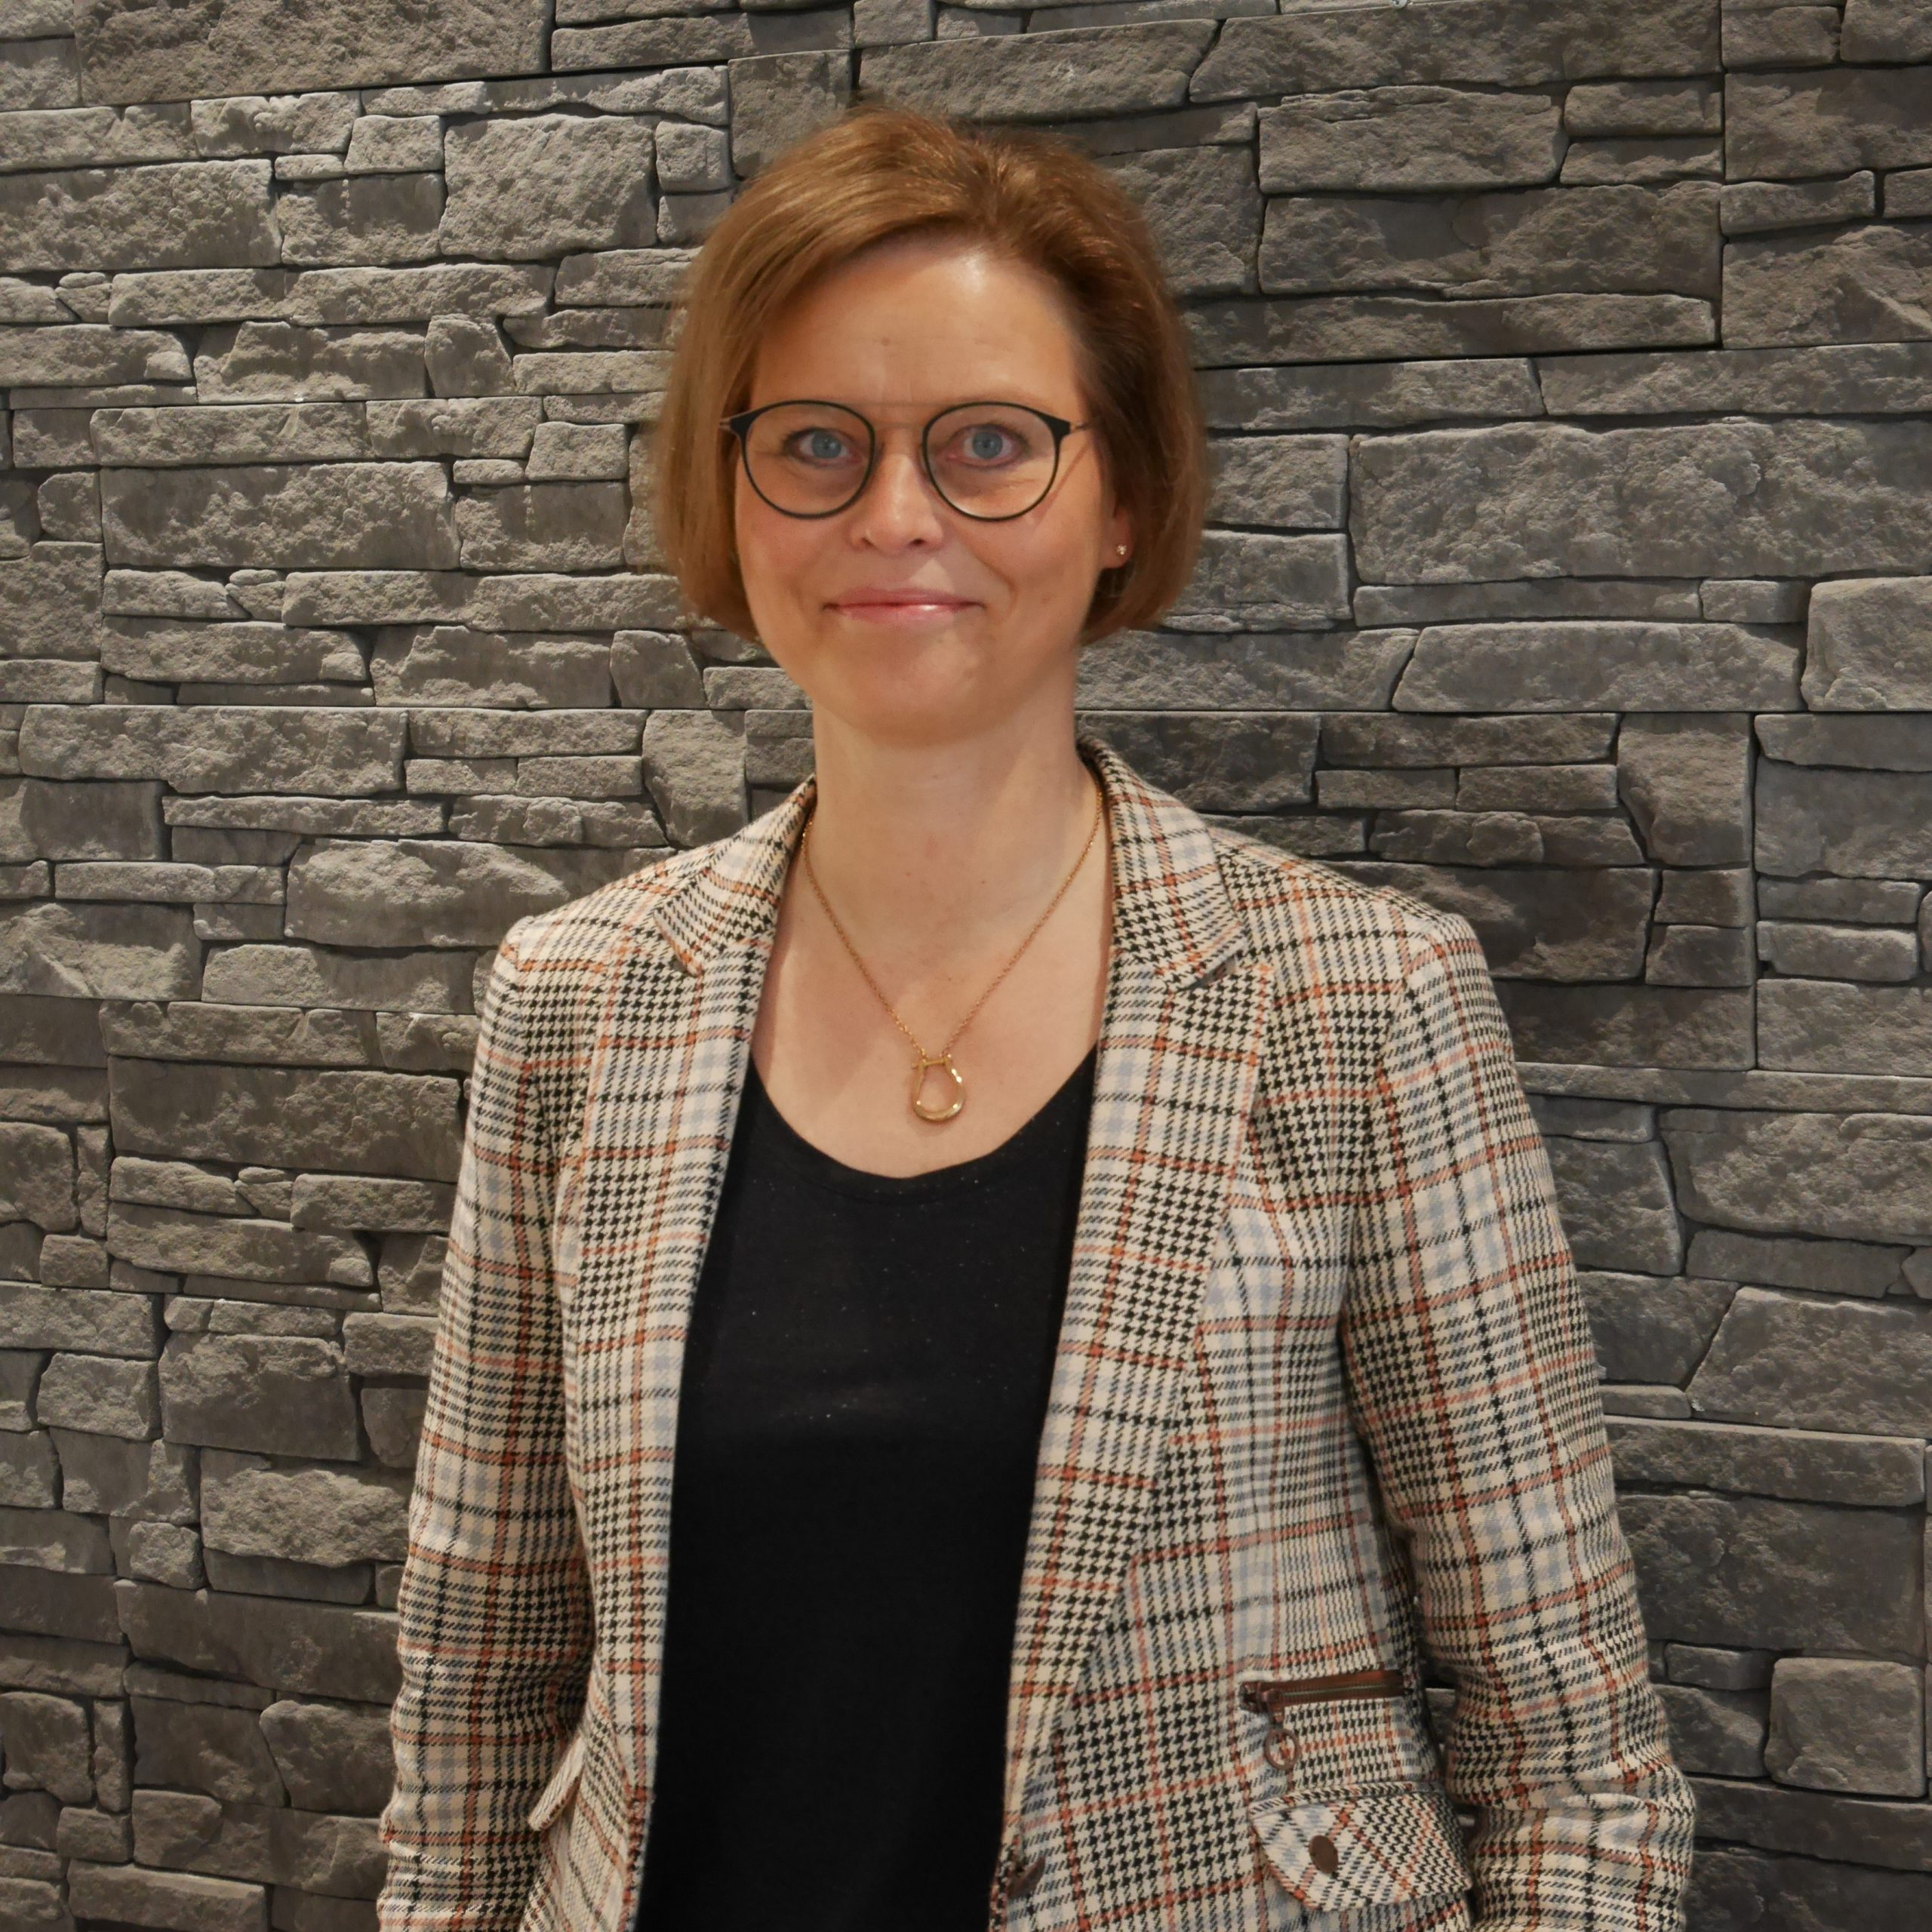 Optik Dopp Sylvia Conrad Inhaberin staatlich geprüfte Augenoptikermeisterin Diplom Kauffrau